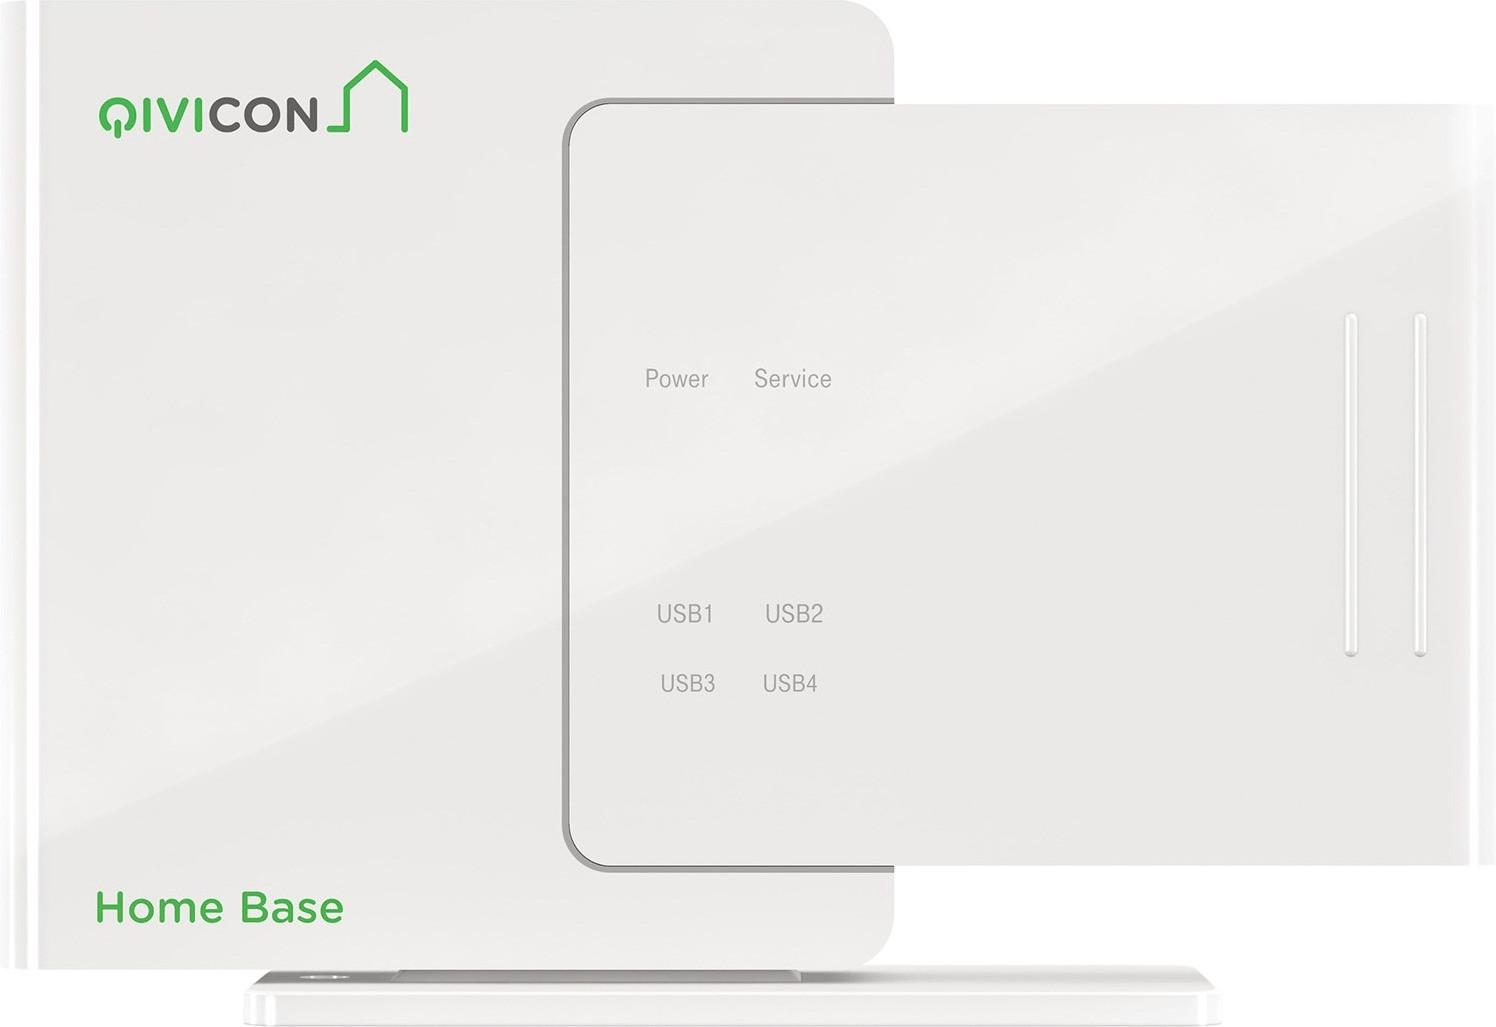 Qivicon Smart Home Base